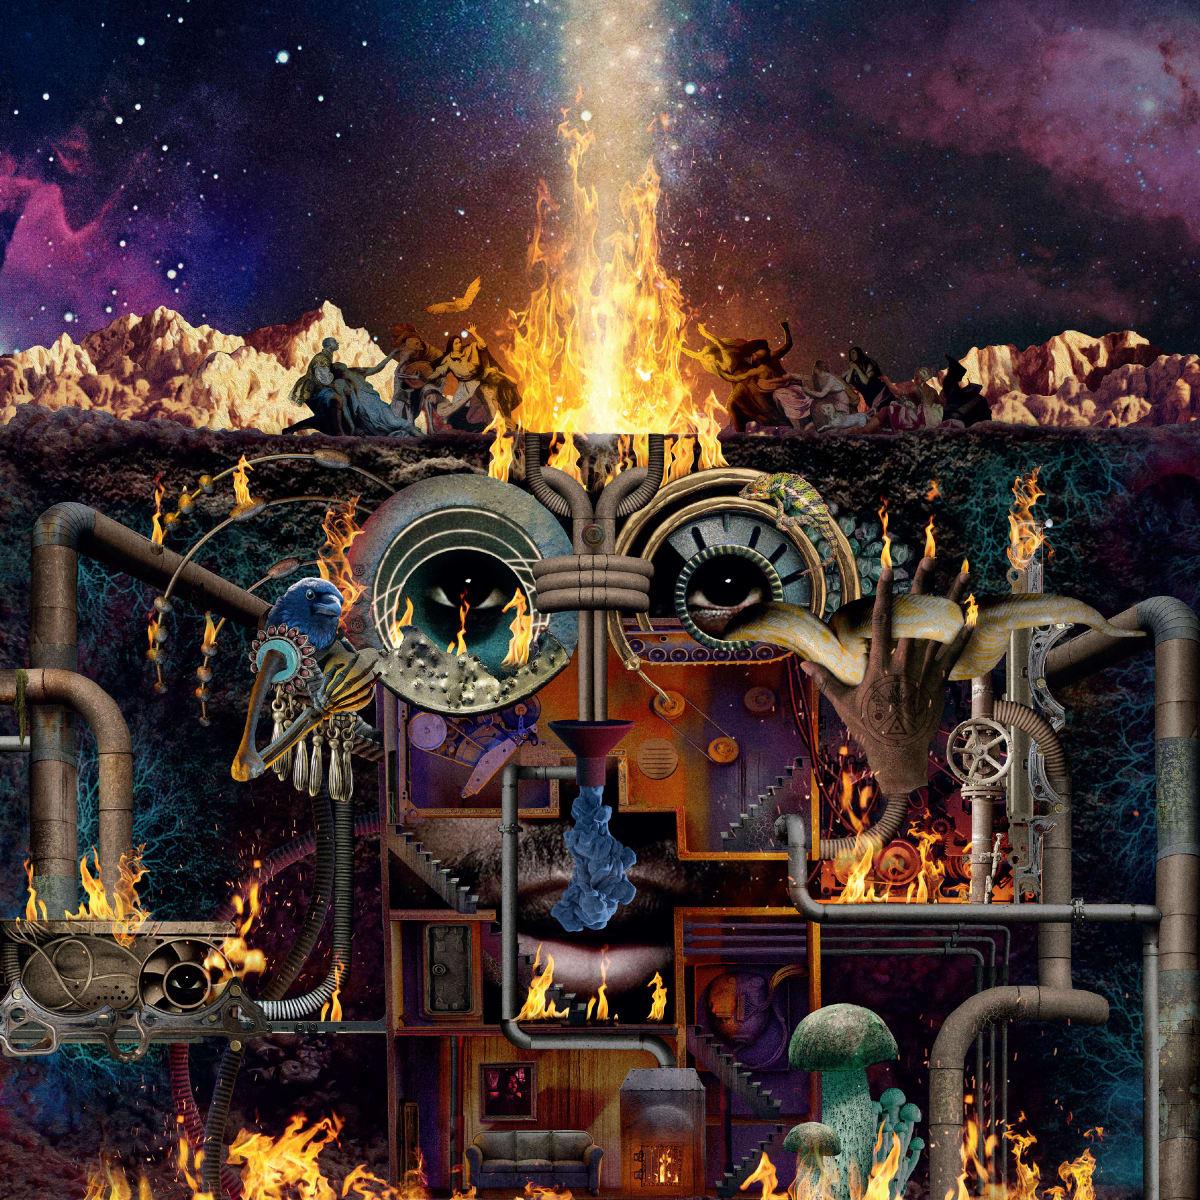 Flying Lotus Unleashes Musical Brilliance On Cosmic, Genre-Bending New Album 'Flamagra'